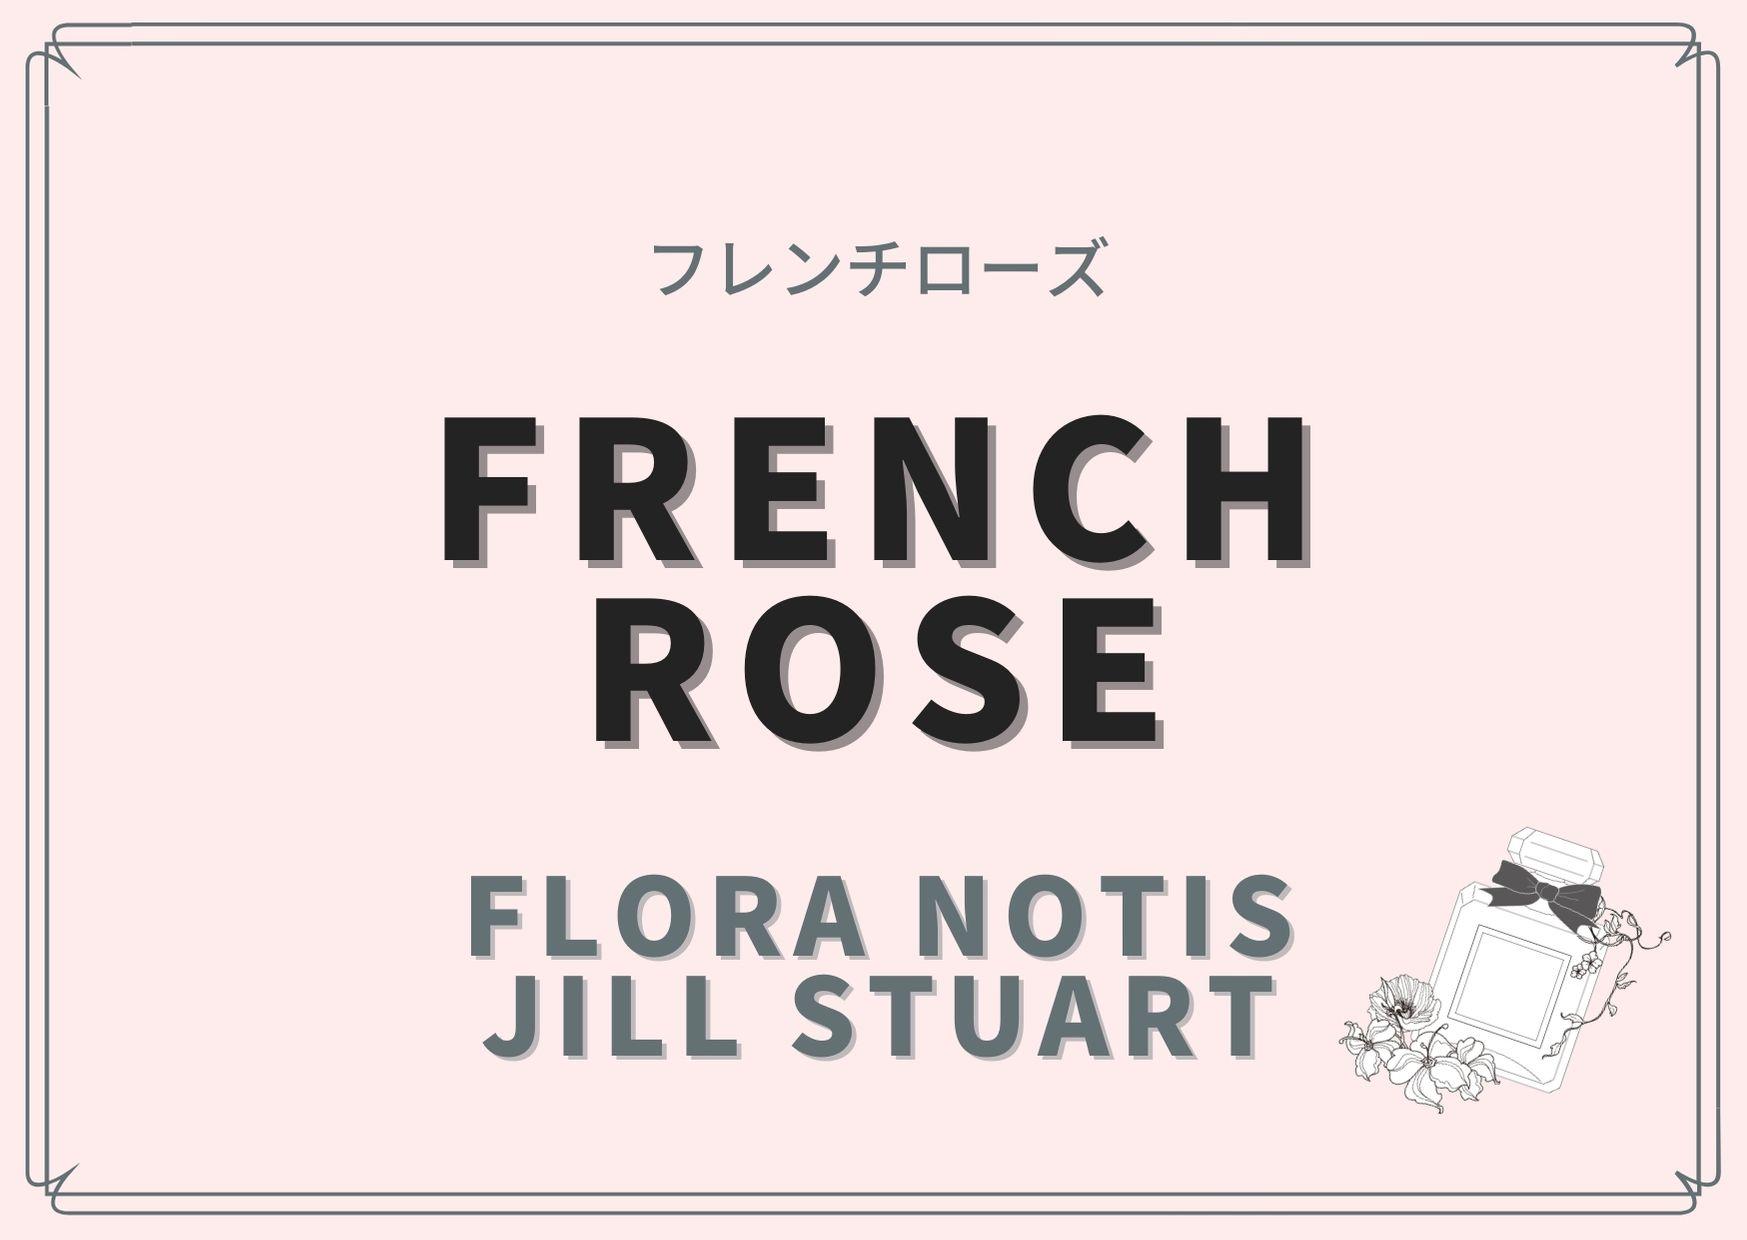 French Rose(フレンチローズ)/Flora Notis JILL STUART